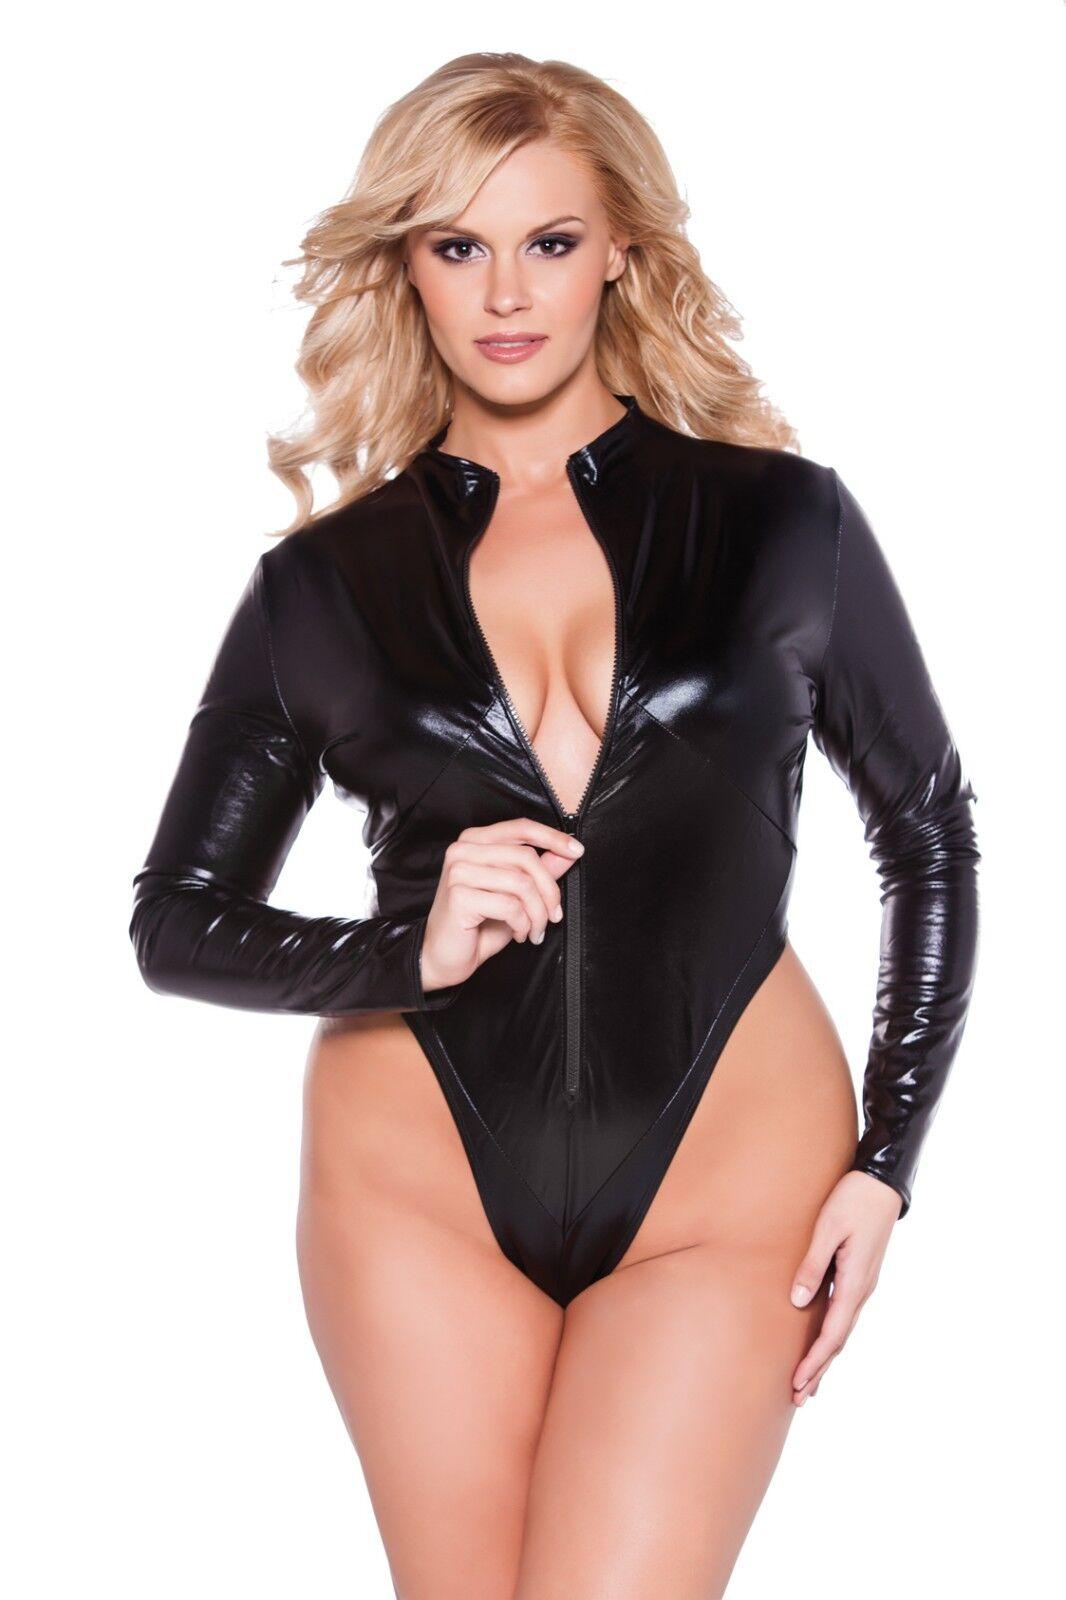 NAUGHTY KITTEN WET LOOK BODYSUIT ZIPPER FRONT SEXY CATSUIT TEDDY New Plus Size